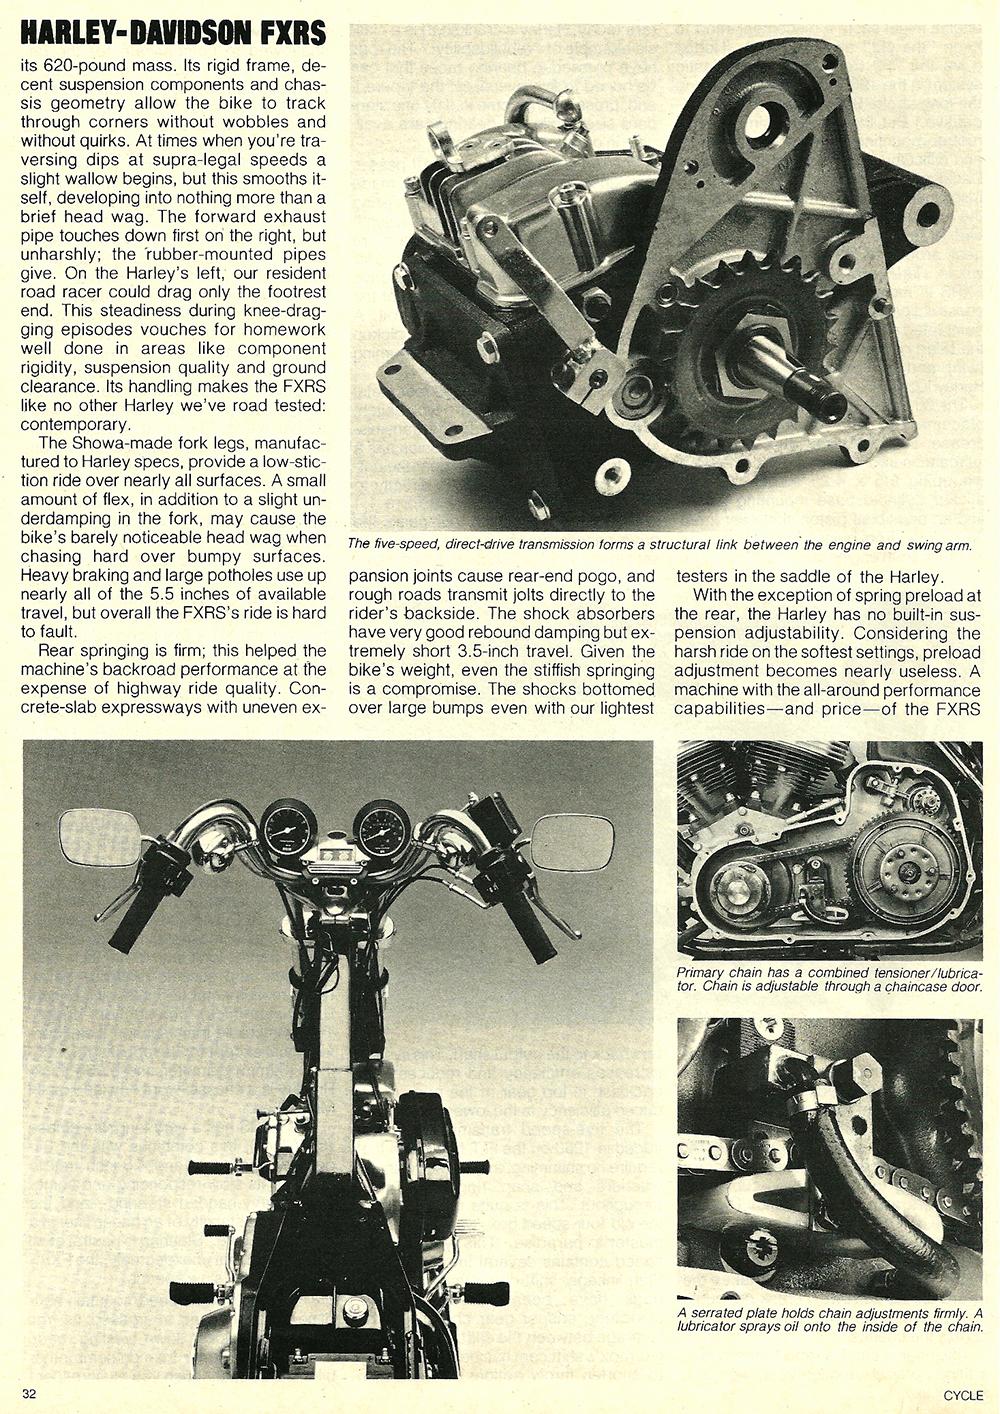 1982 Harley-Davidson FXRS road test 05.jpg